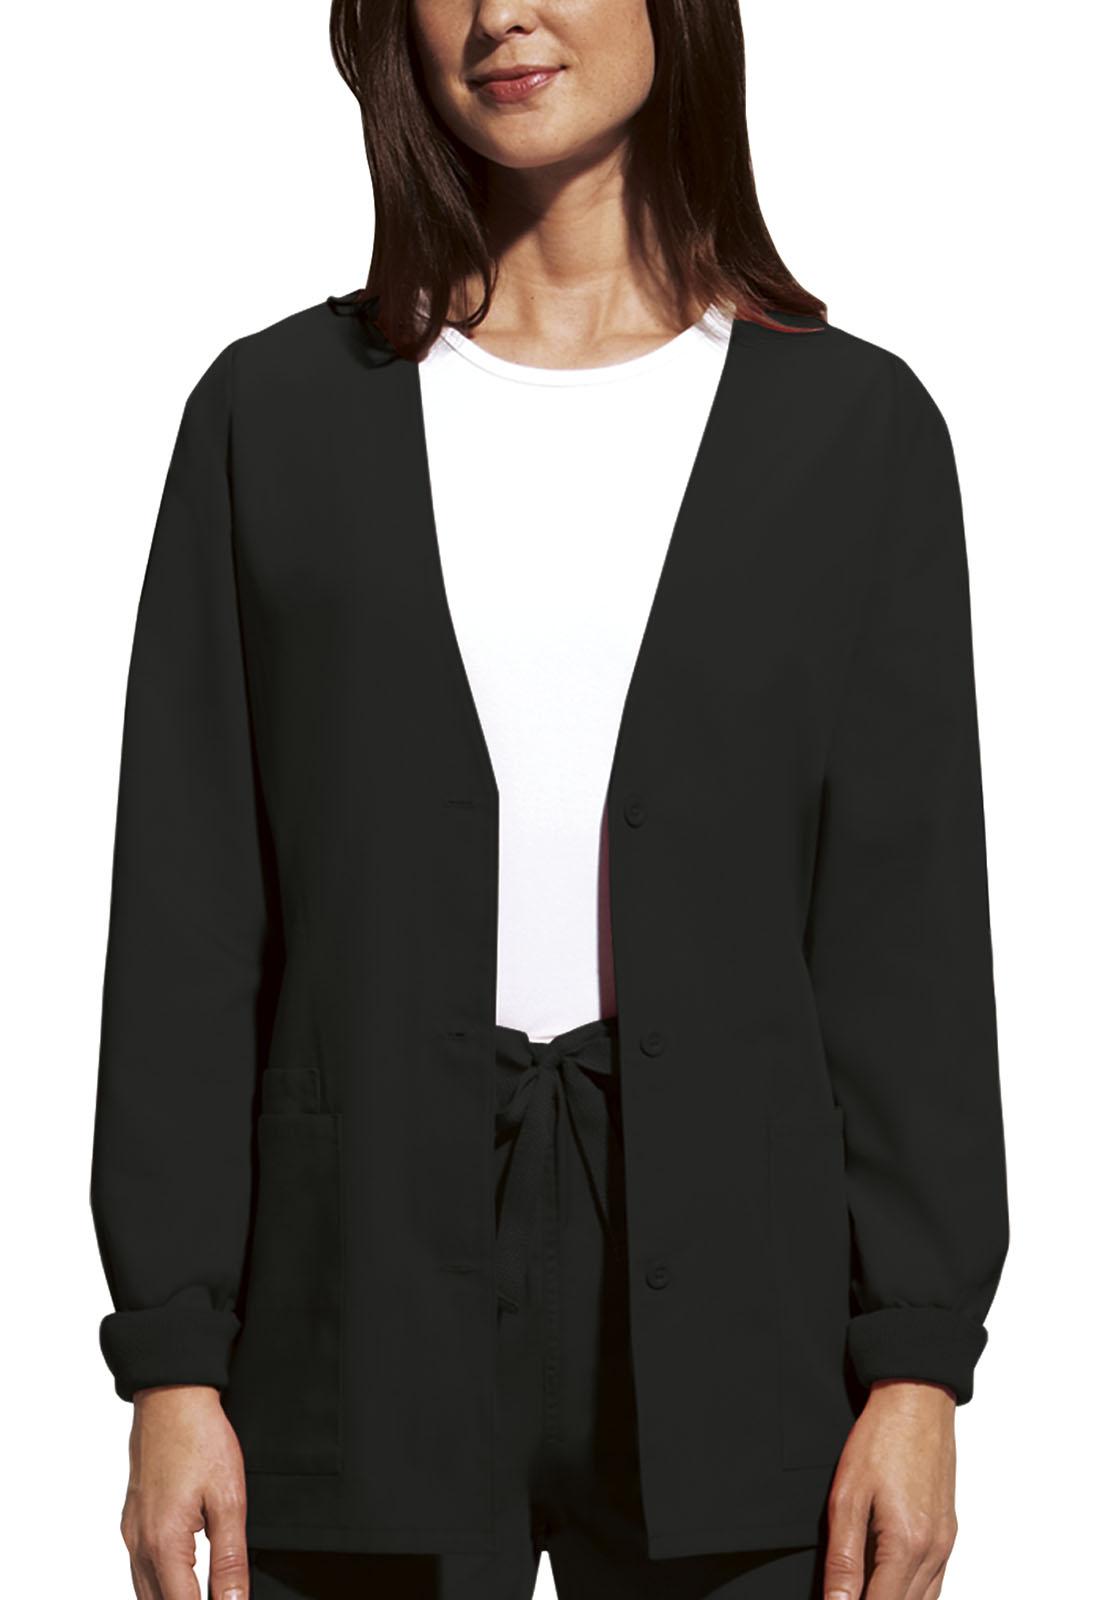 80bcc70cf0c WW Originals Cardigan Warm-Up Jacket in Black 4301-BLKW from Scrubs ...